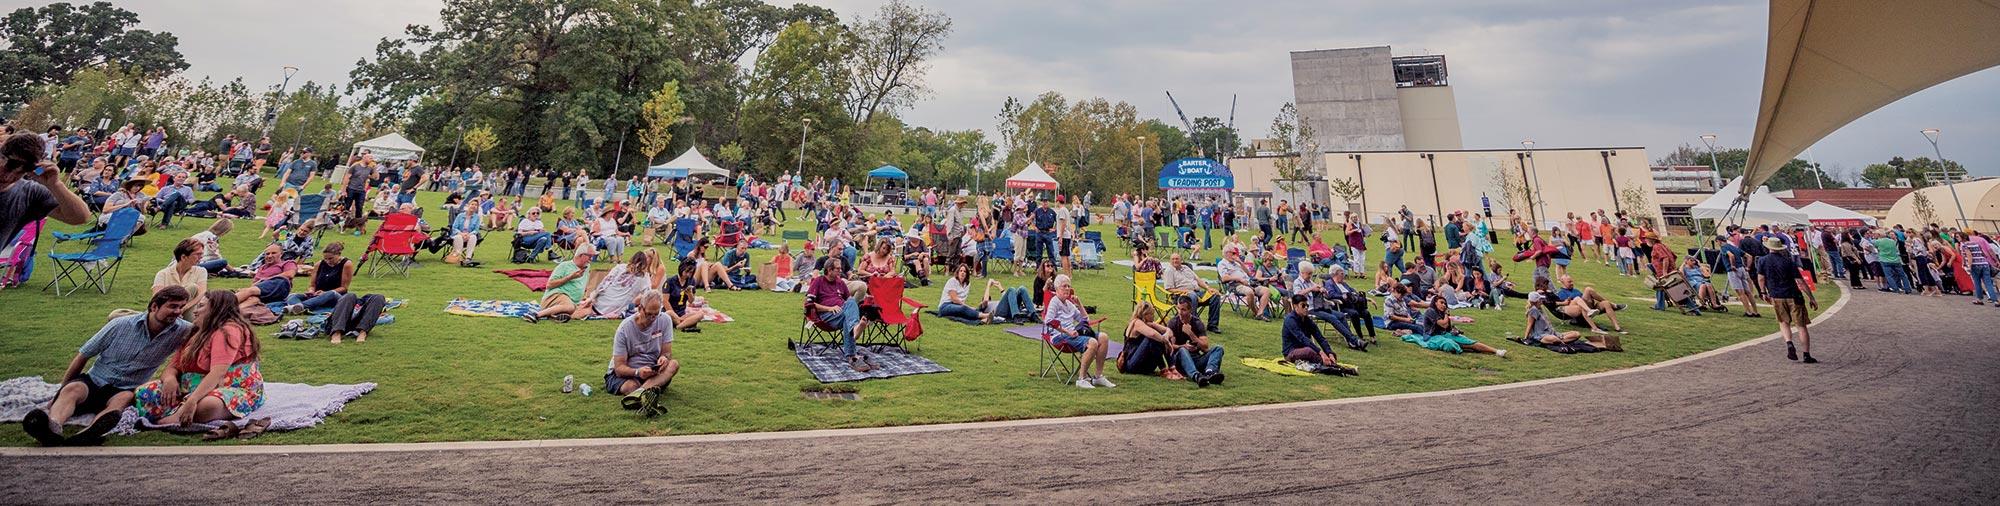 Momentary festival crowd